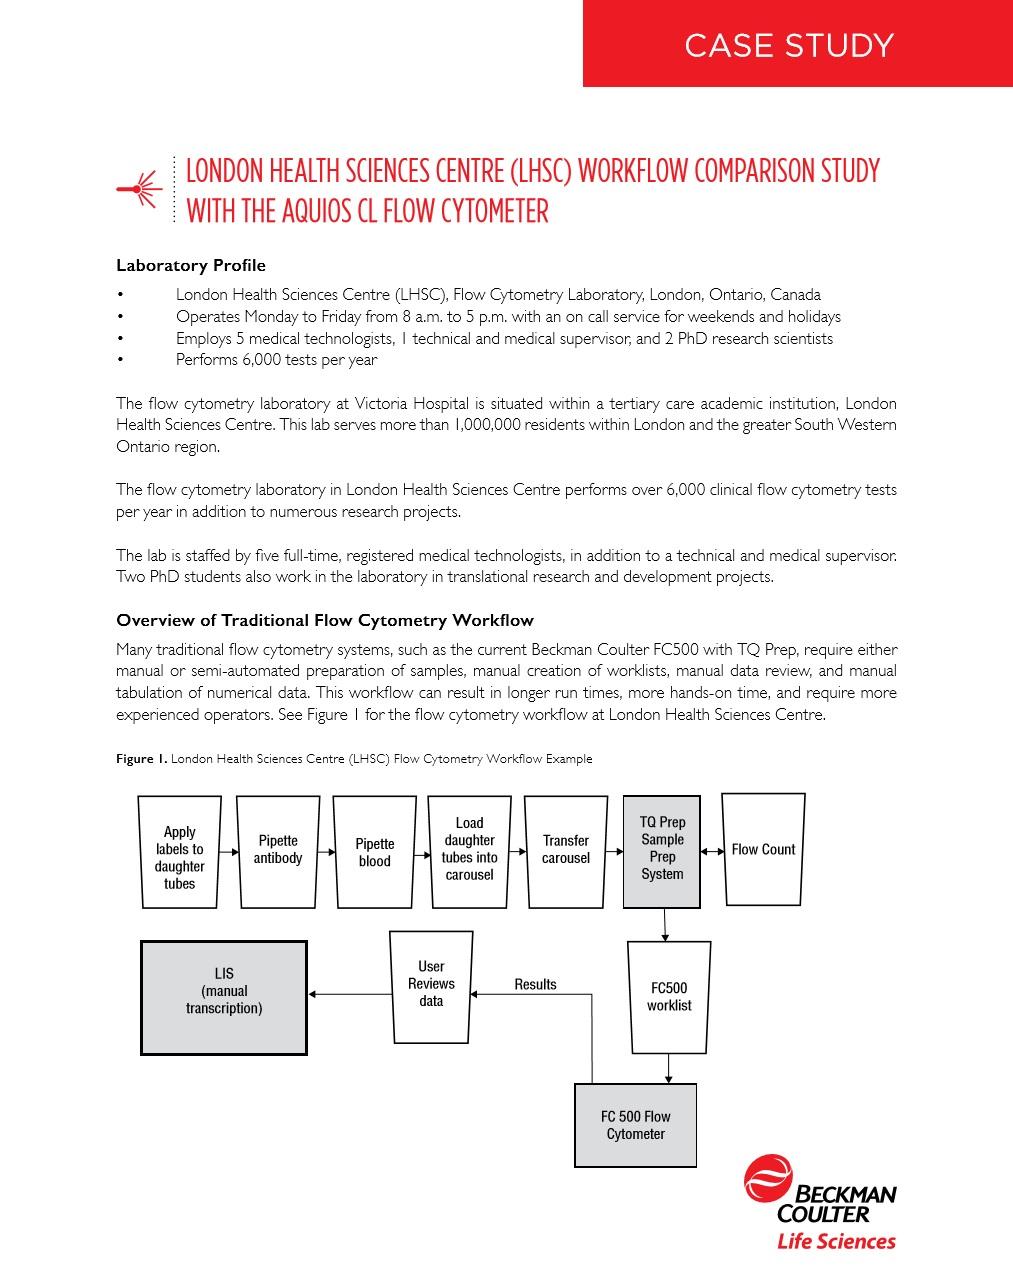 FLOWC_HIV CD4 London health Sciences AQUIOS - Section 7